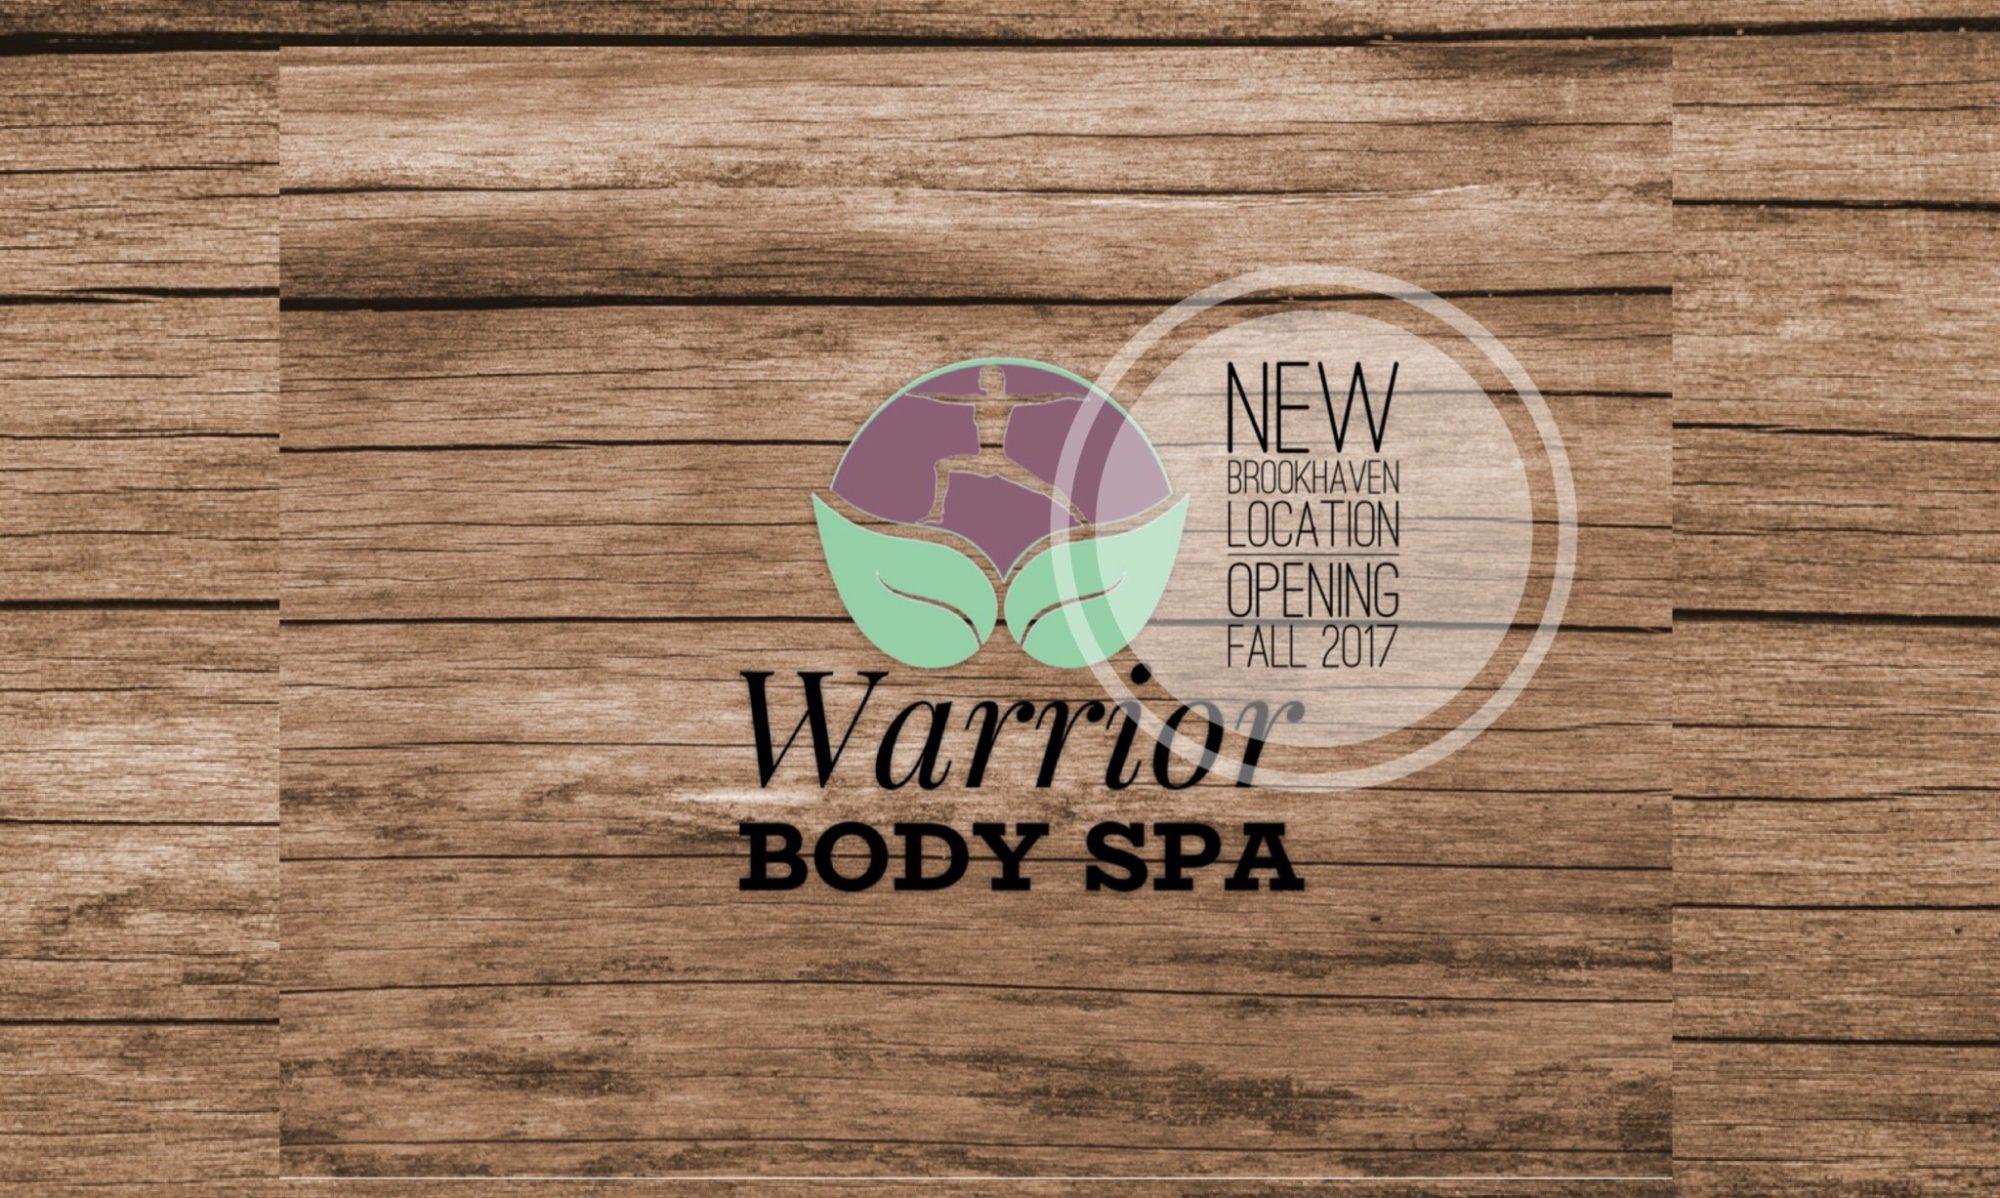 Warrior Body Spa